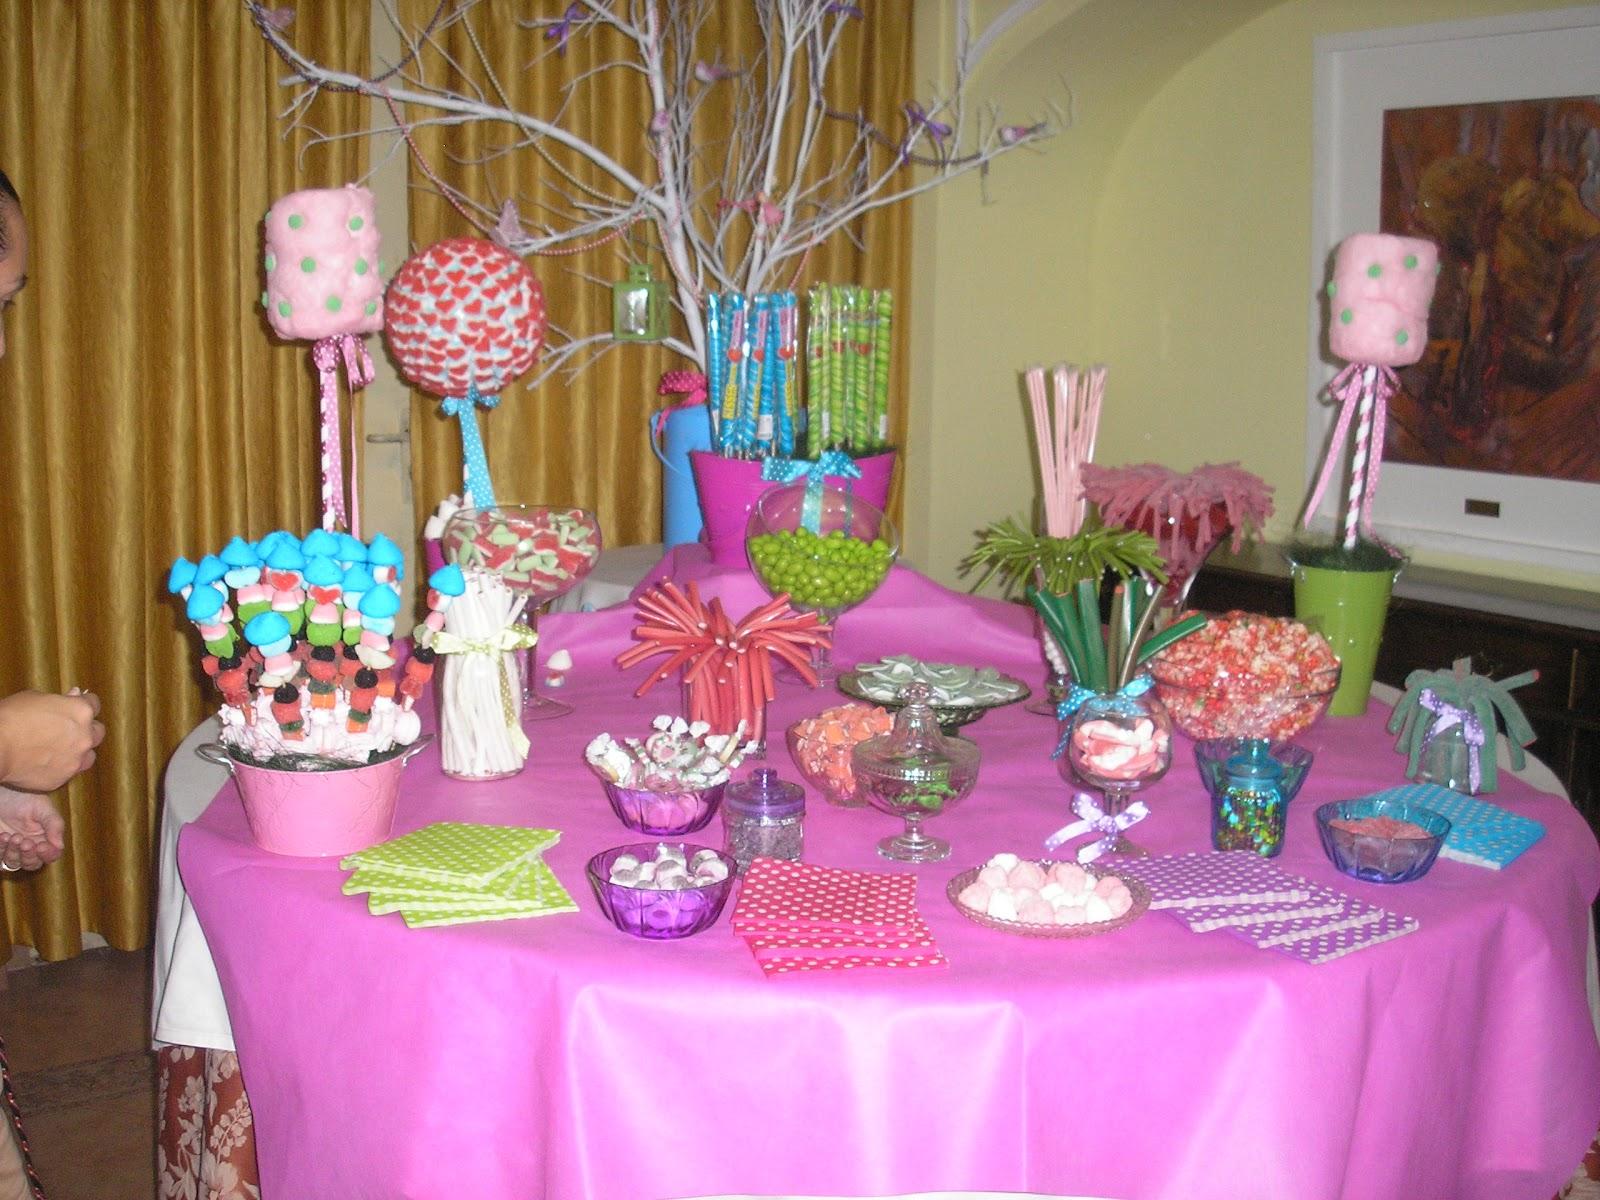 La casa de carmen mesa decorada comunion - Mesas decoradas para comunion ...